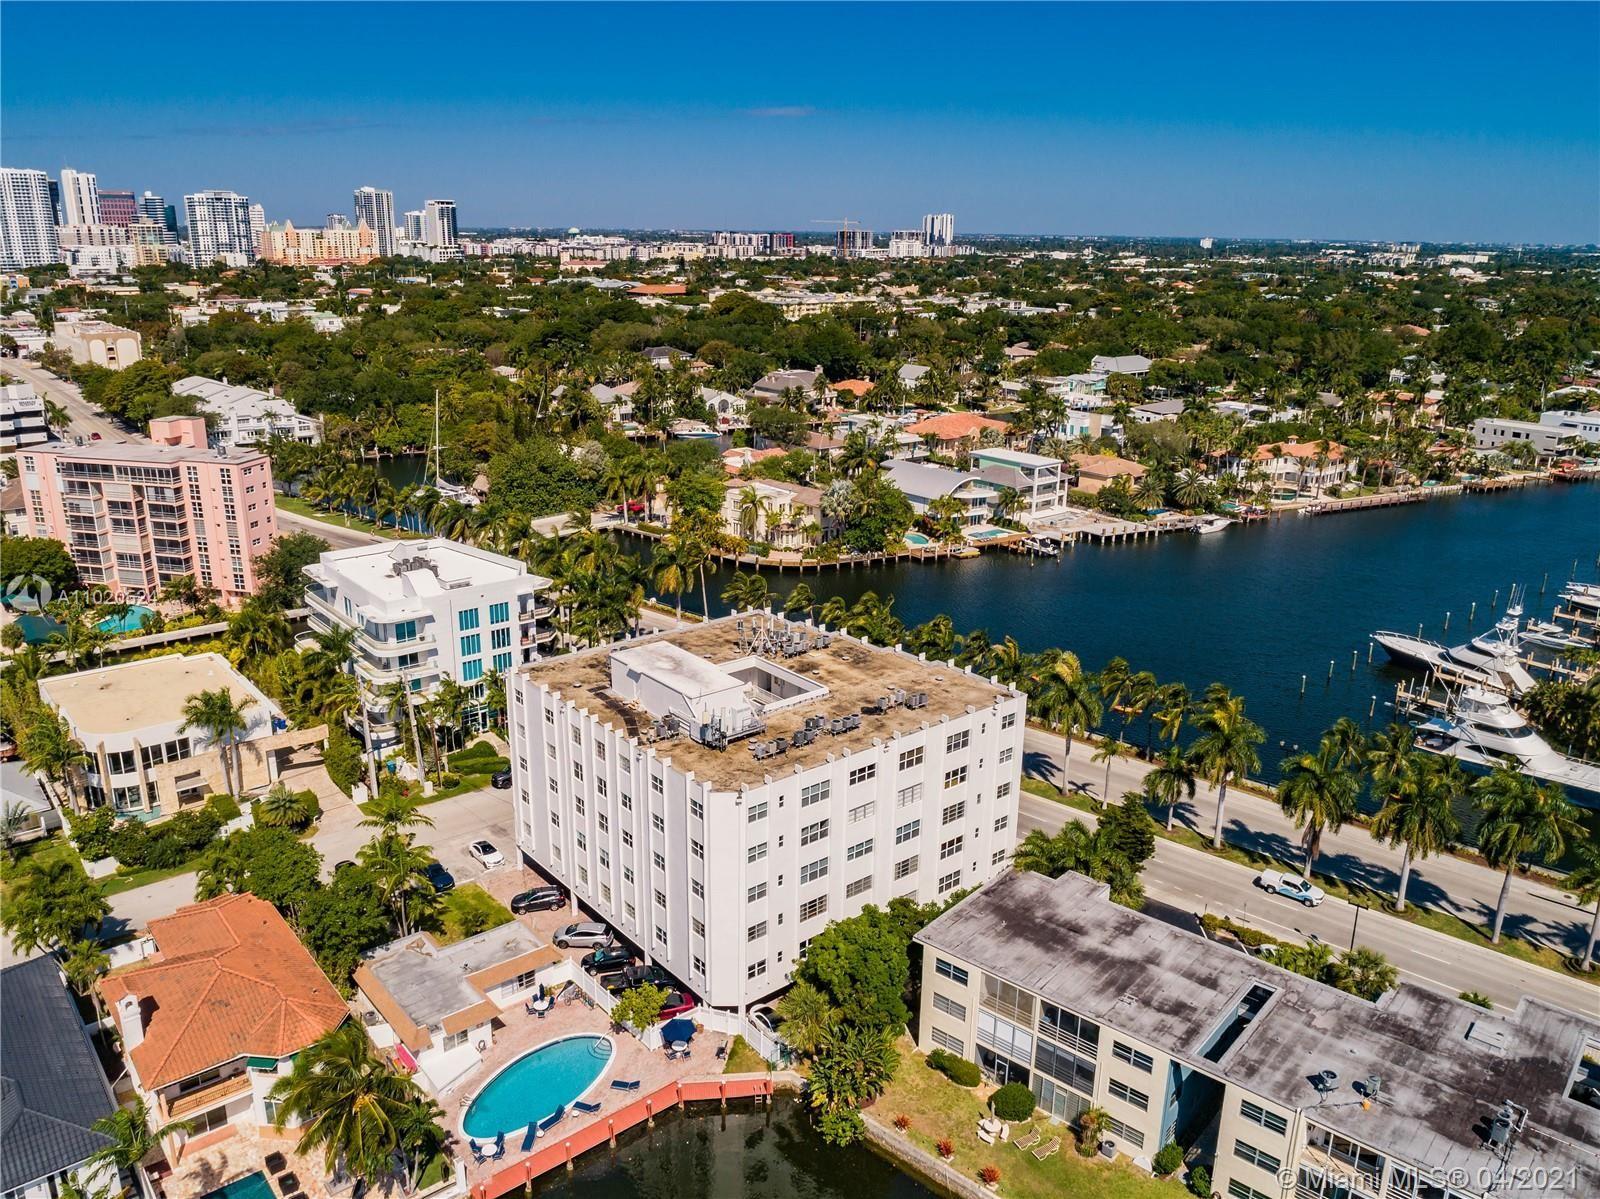 1770 E Las Olas Blvd #503, Fort Lauderdale, FL 33301 - #: A11020524